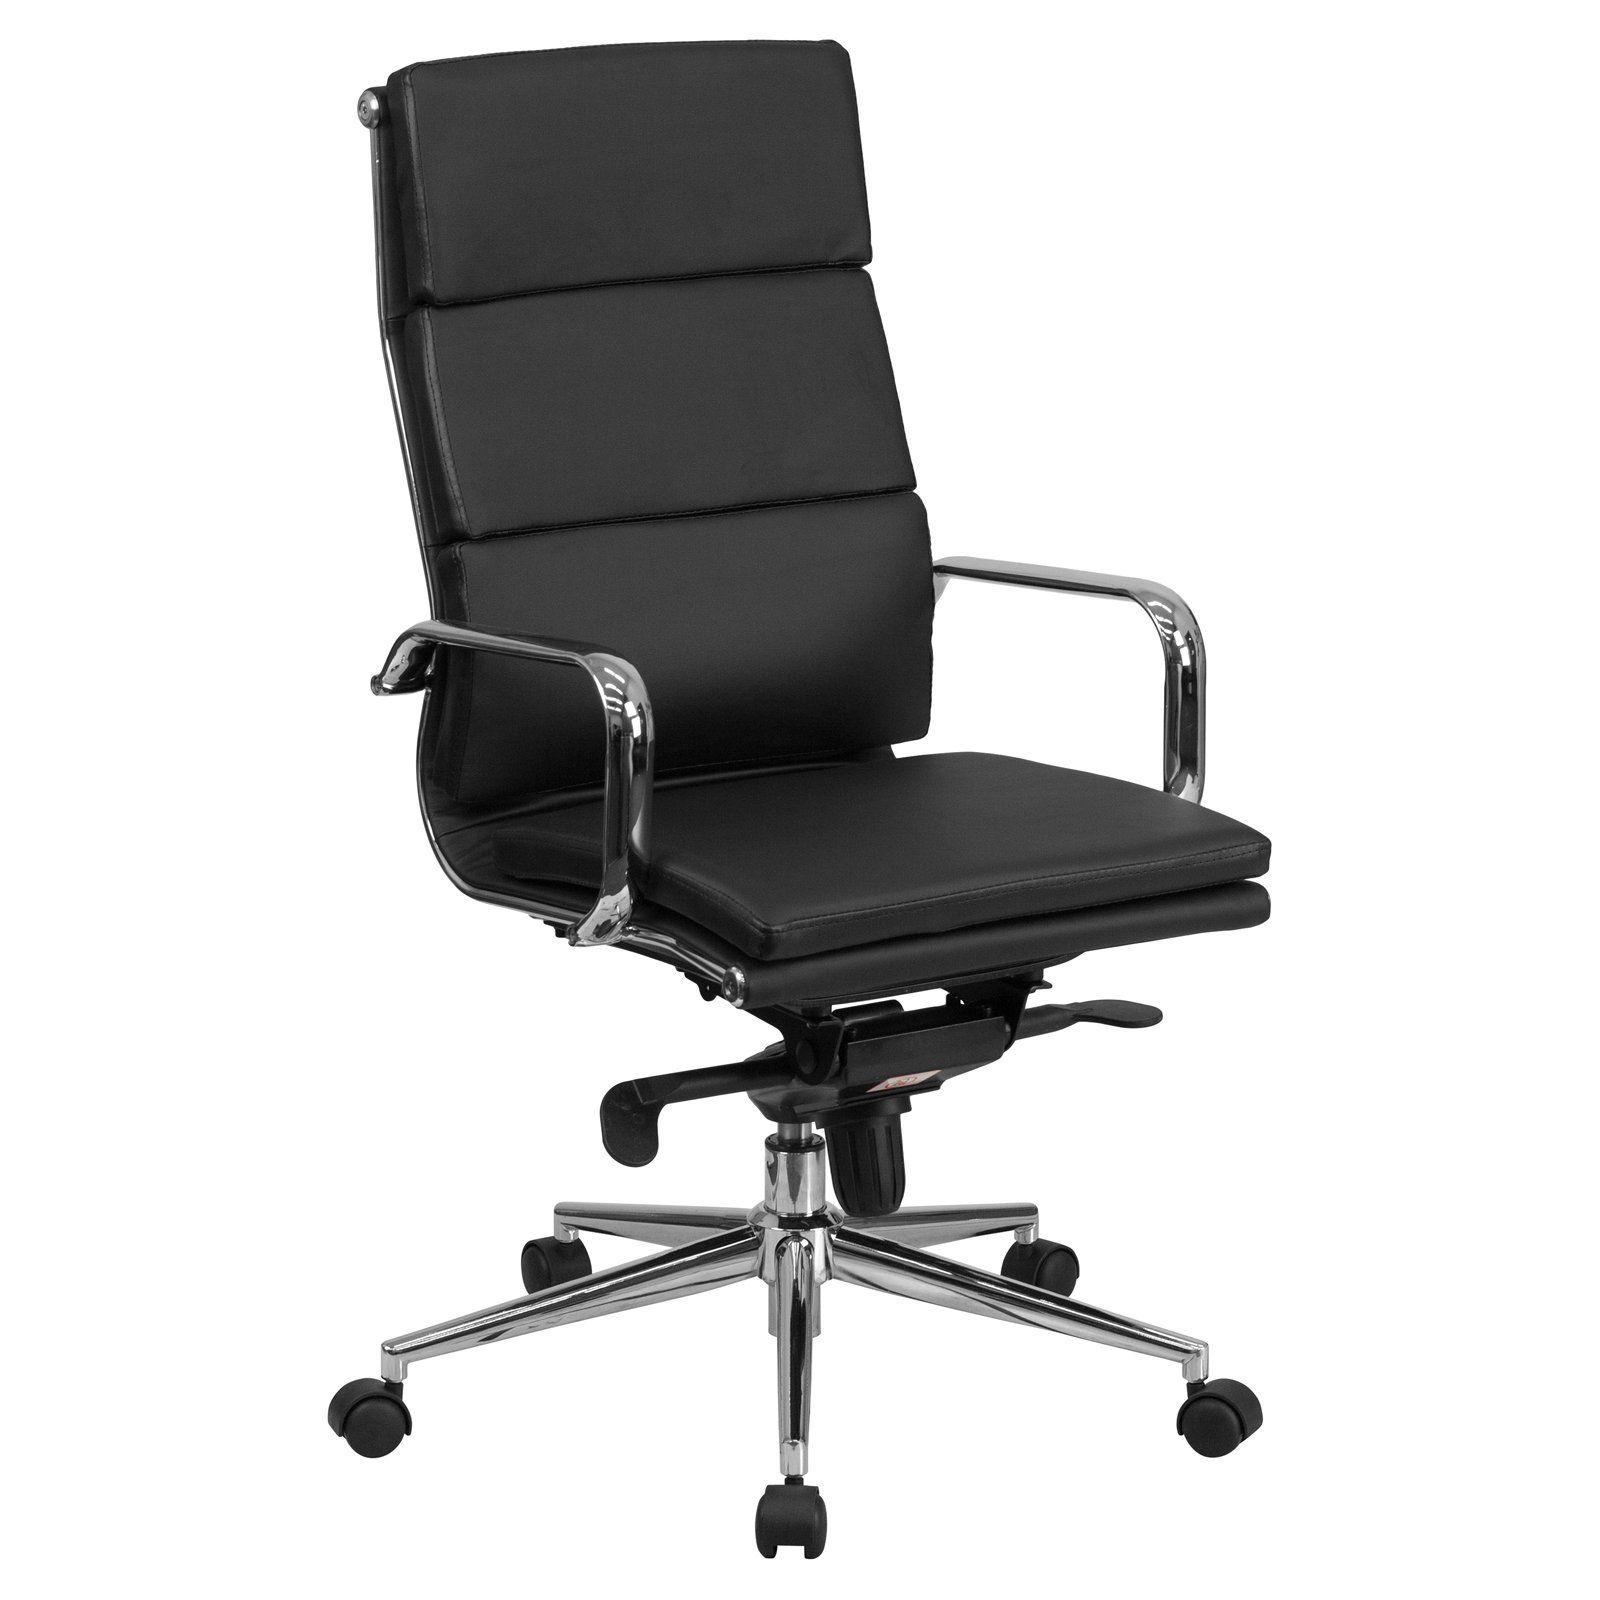 Wondrous Flash Furniture High Back Leather Executive Swivel Office Beatyapartments Chair Design Images Beatyapartmentscom